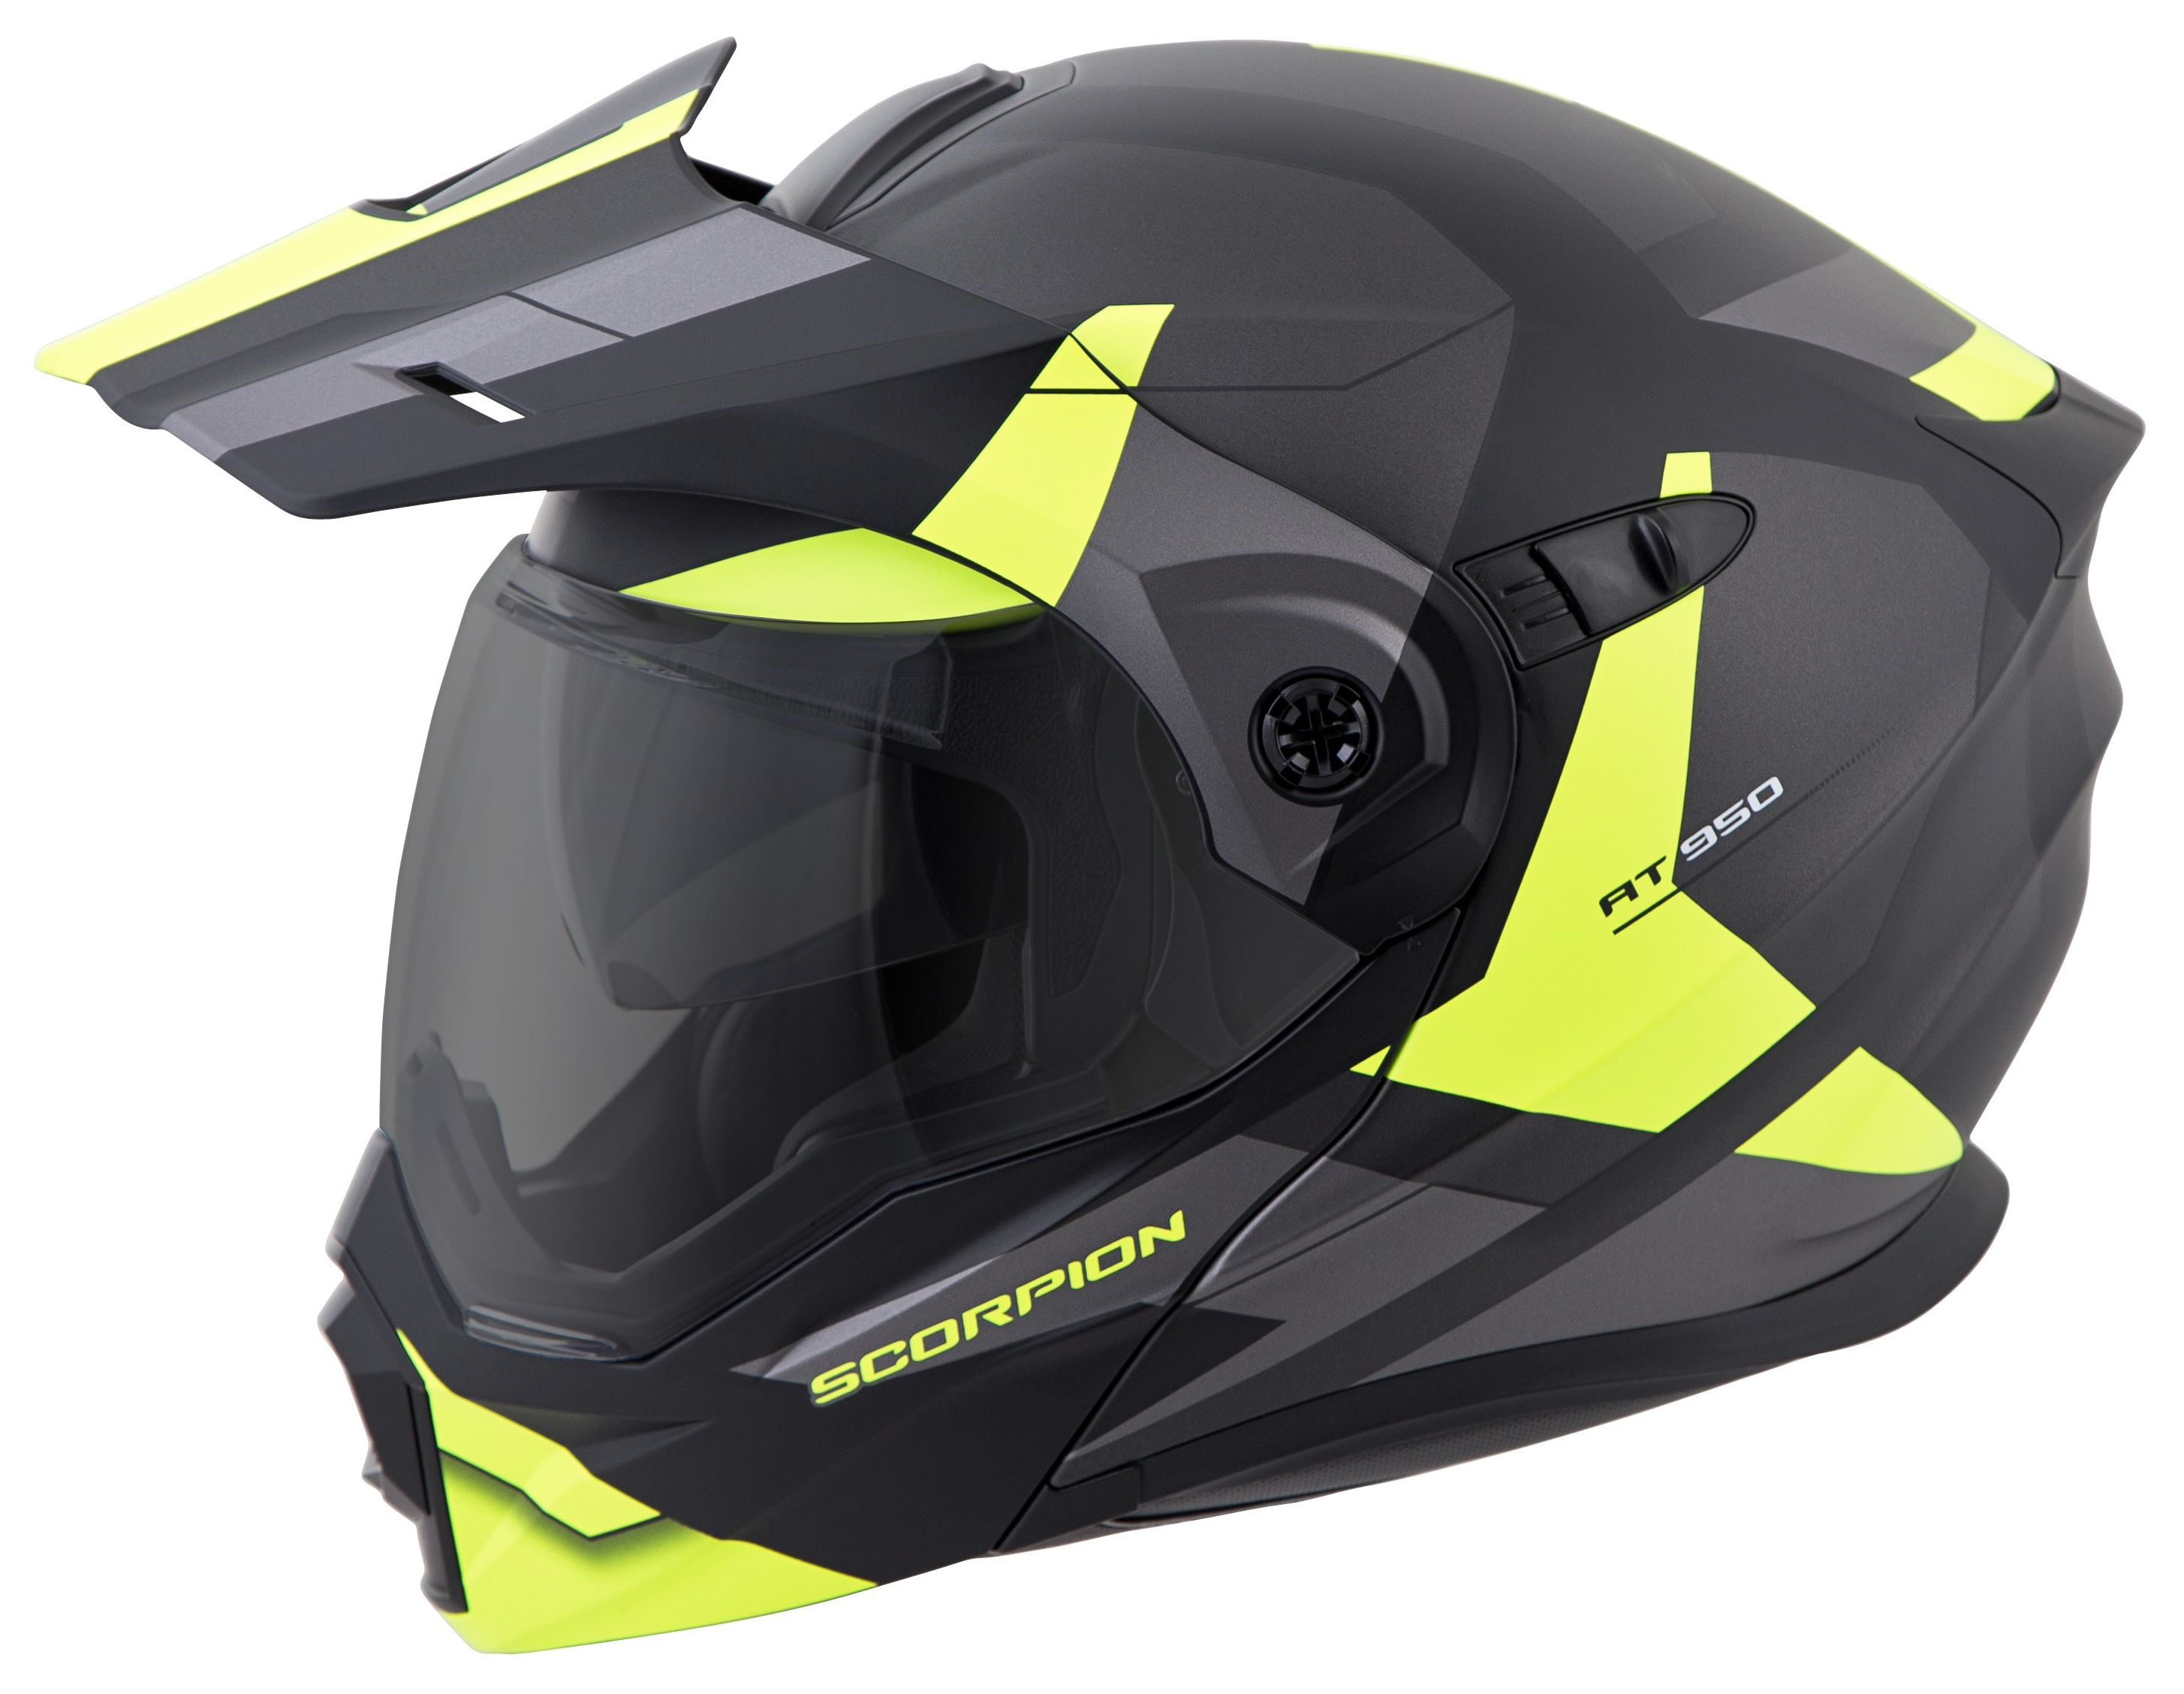 40cfd62e MotoMundi - Cascos Abatibles Scorpion EXO-AT950 Neocon Helmet